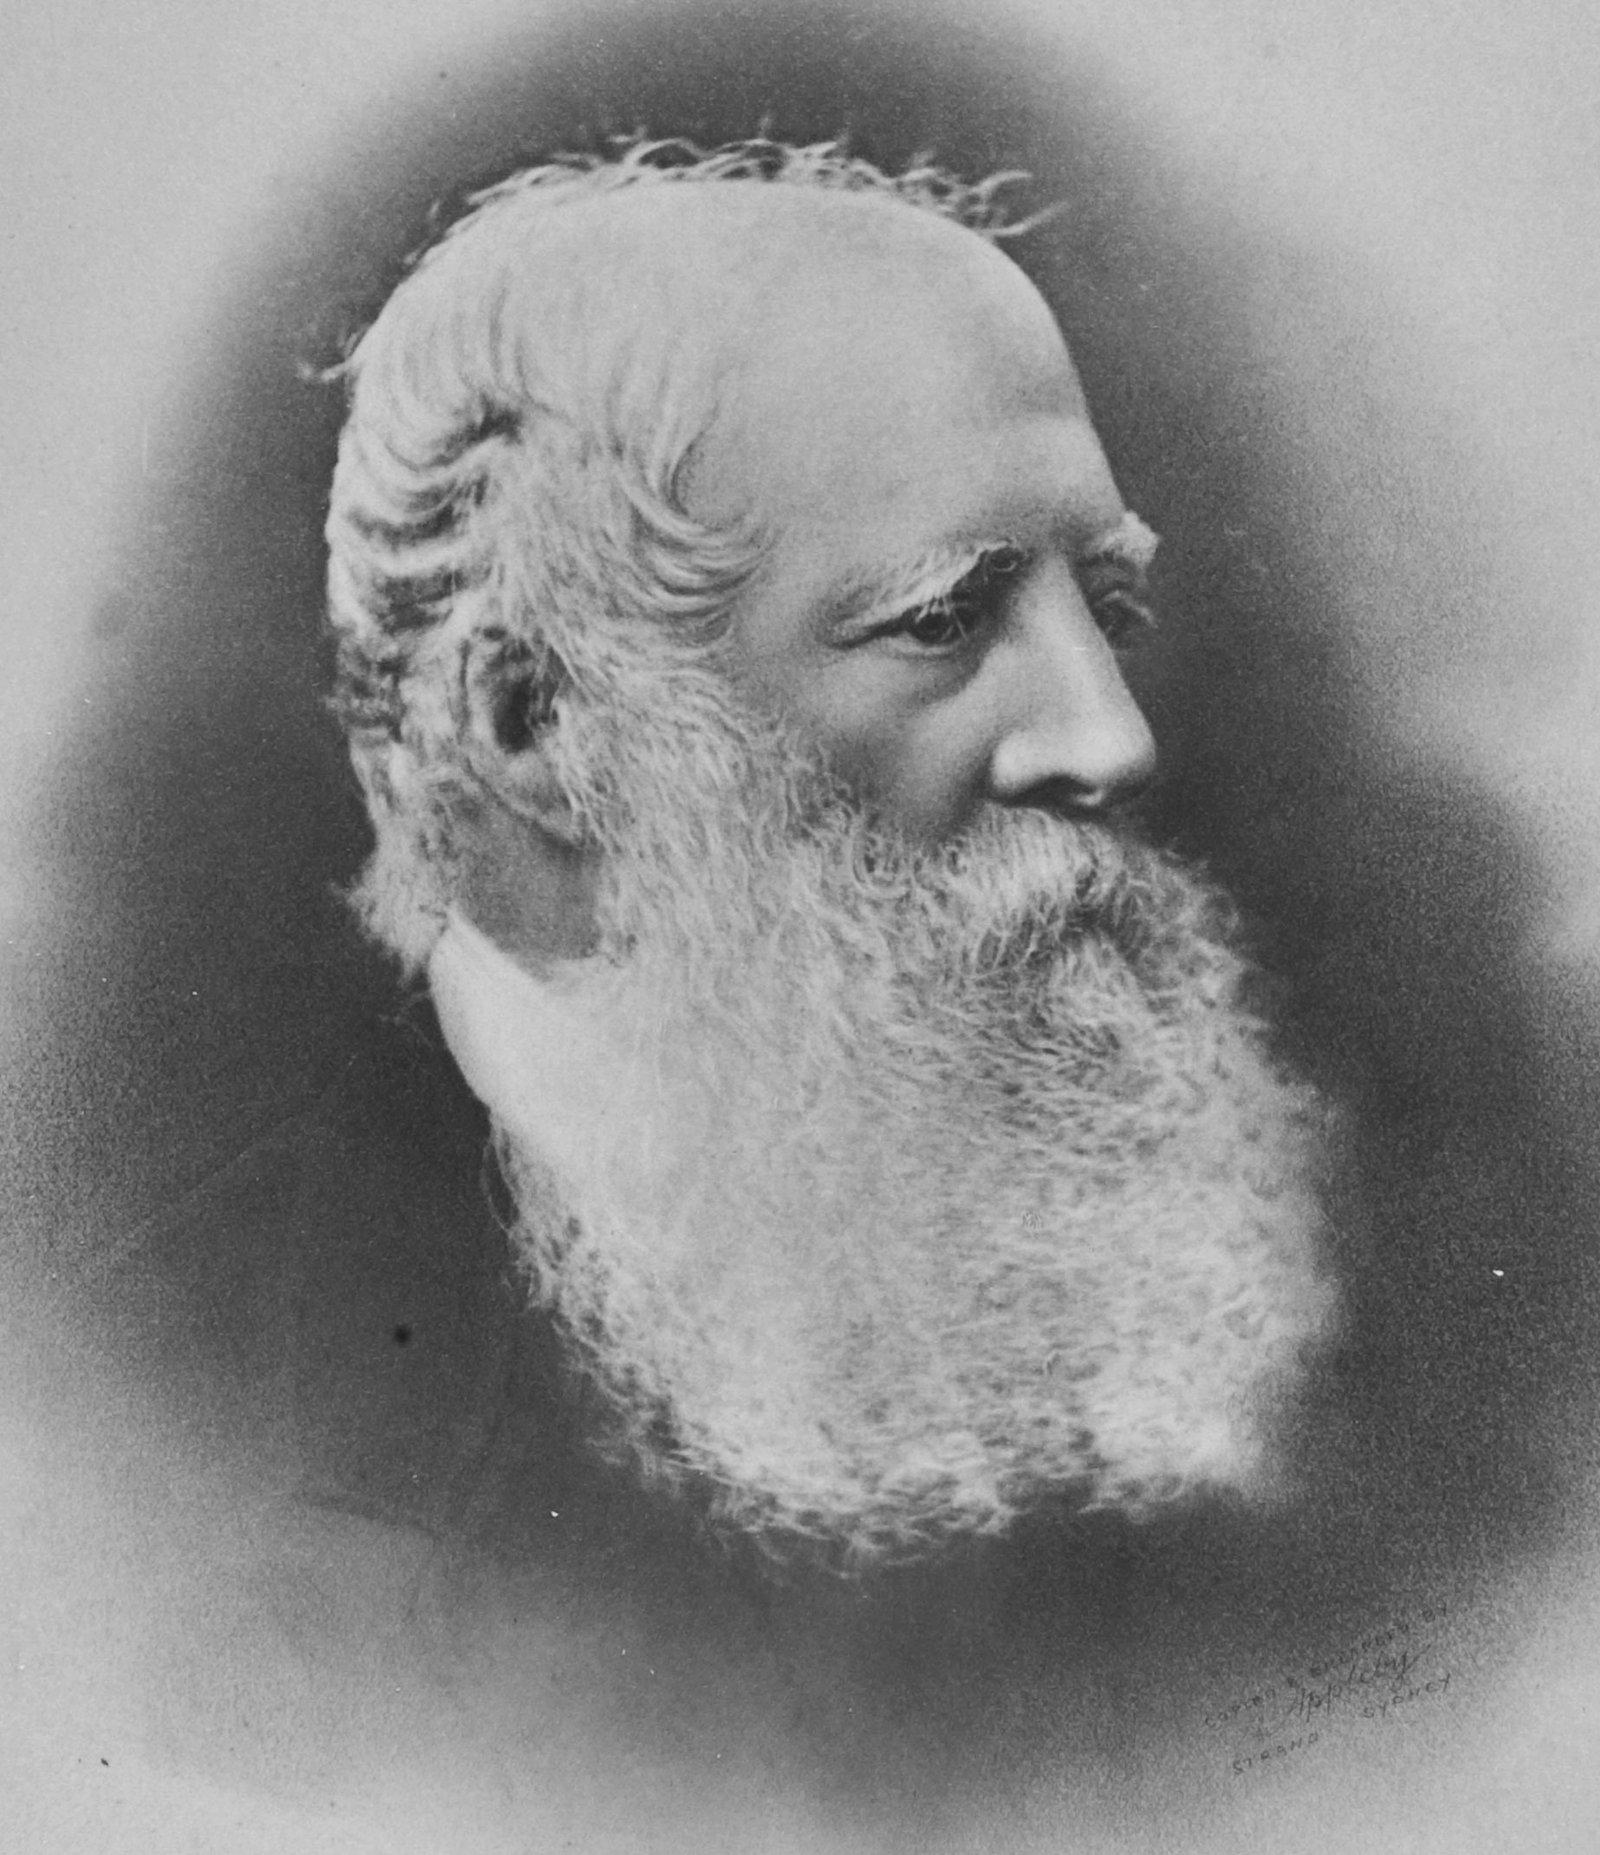 Rev William Branwhite Clarke, Secretary and Curator, 1841-1843